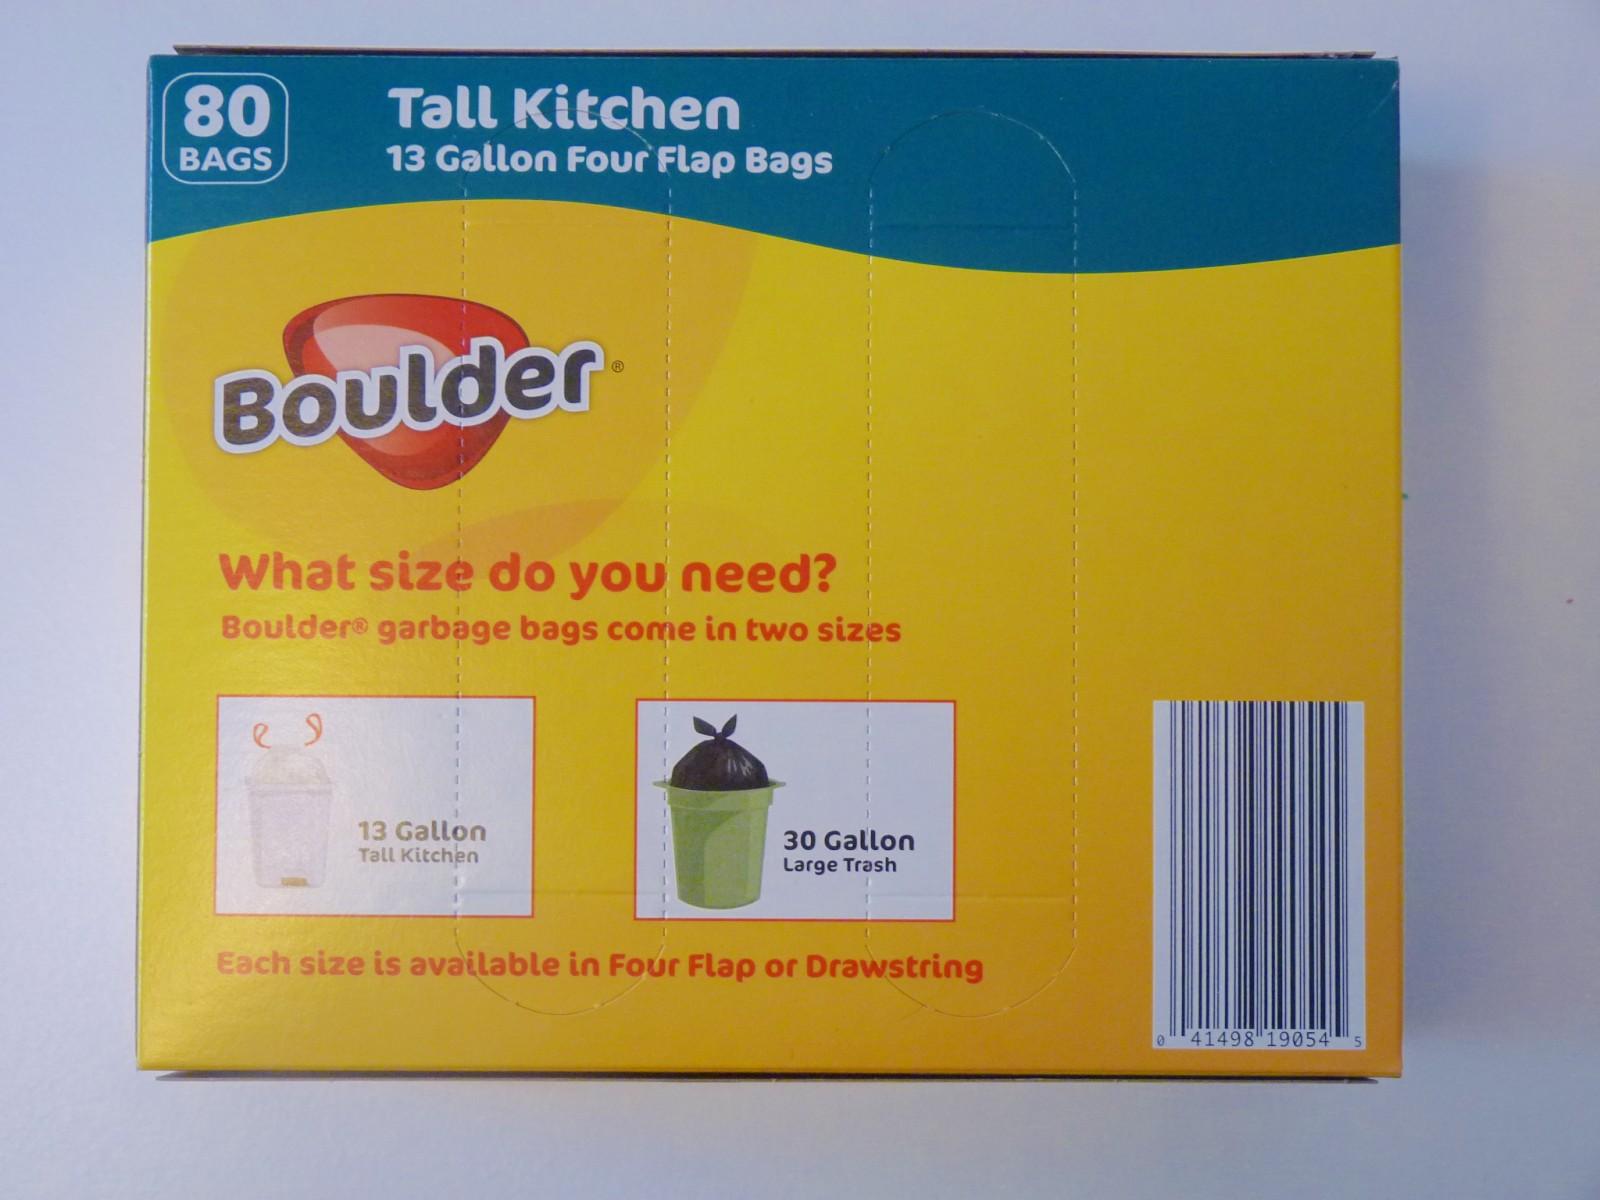 Boulder Four Flap 13 Gallon Garbage Bags Aldi Product